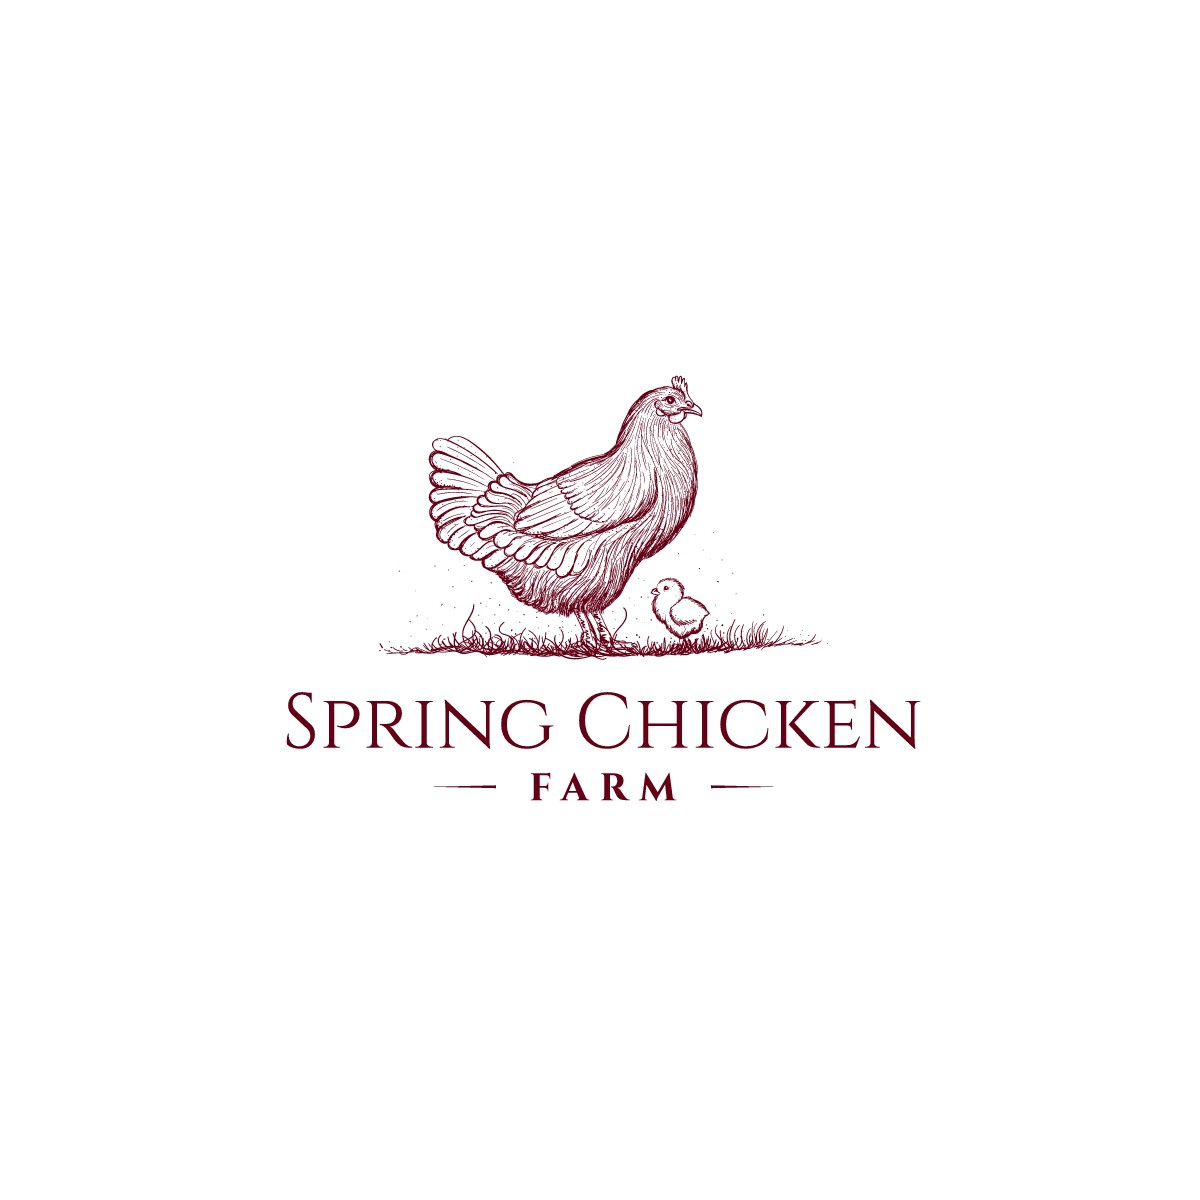 Spring Chicken Farm